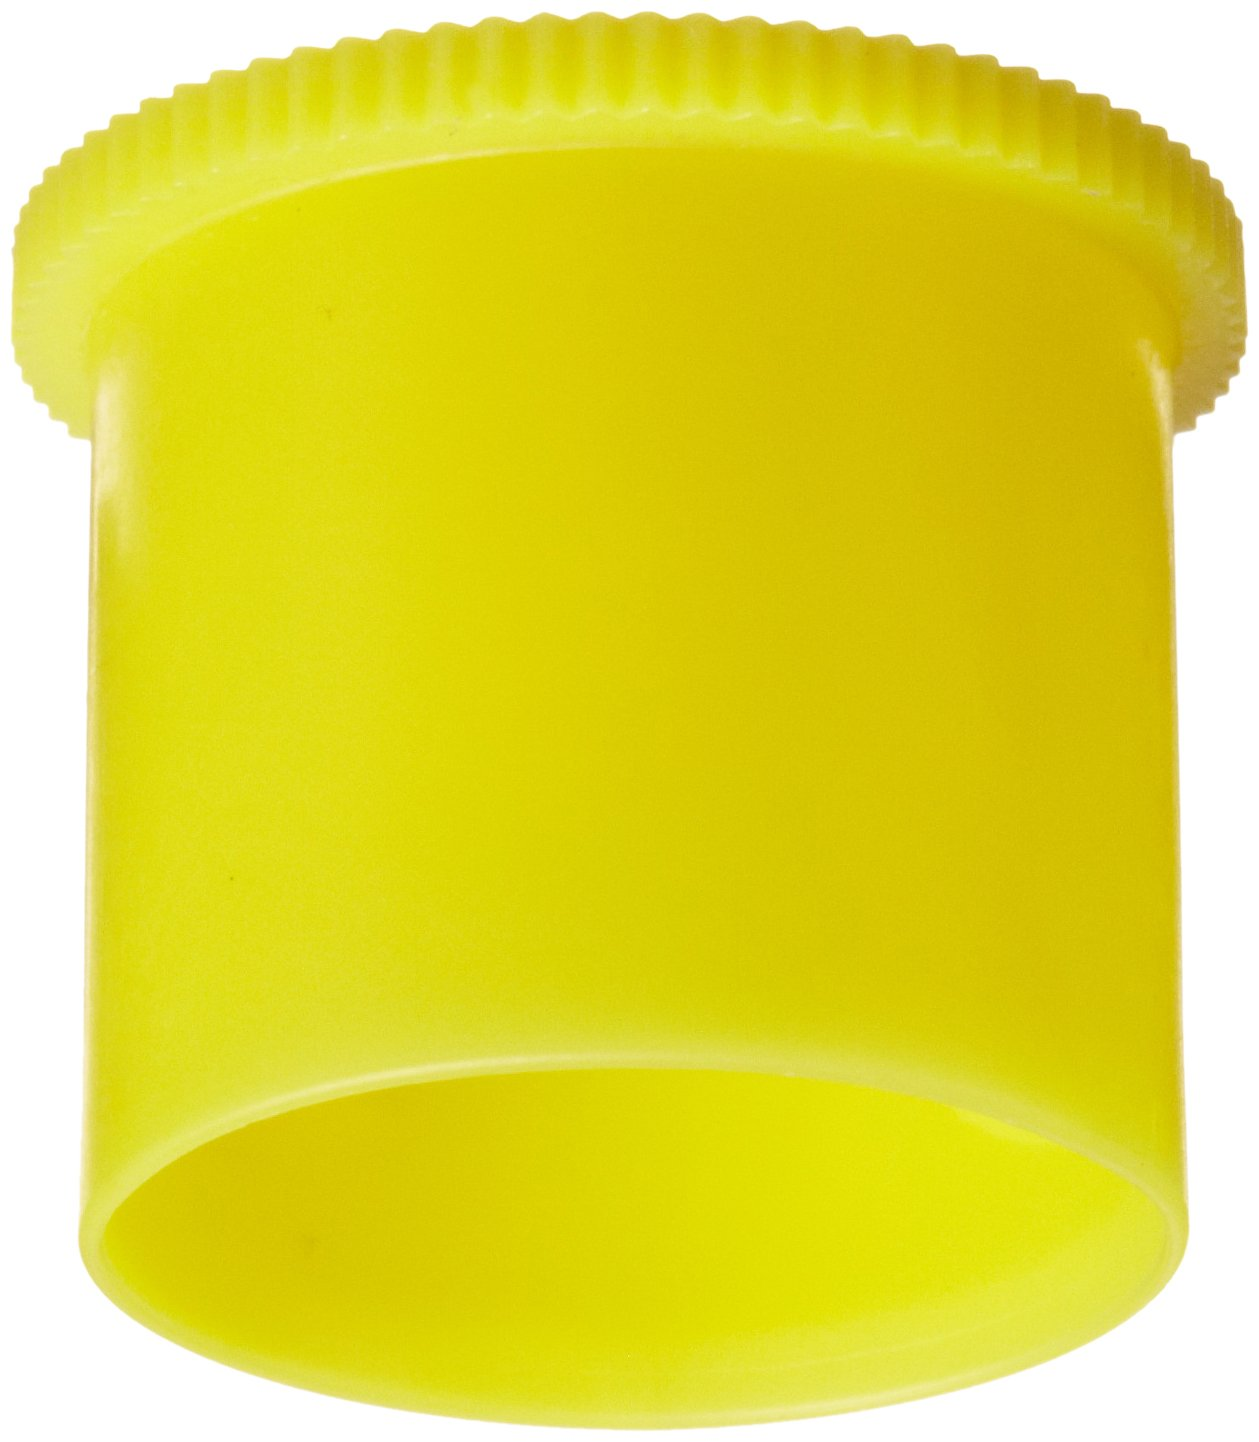 Kapsto 205 K 14 x 14 Ethylene Vinyl Acetate Protective Cap Pack of 100 14 mm Tube OD Poppelman Plastics 20514140000 Yellow